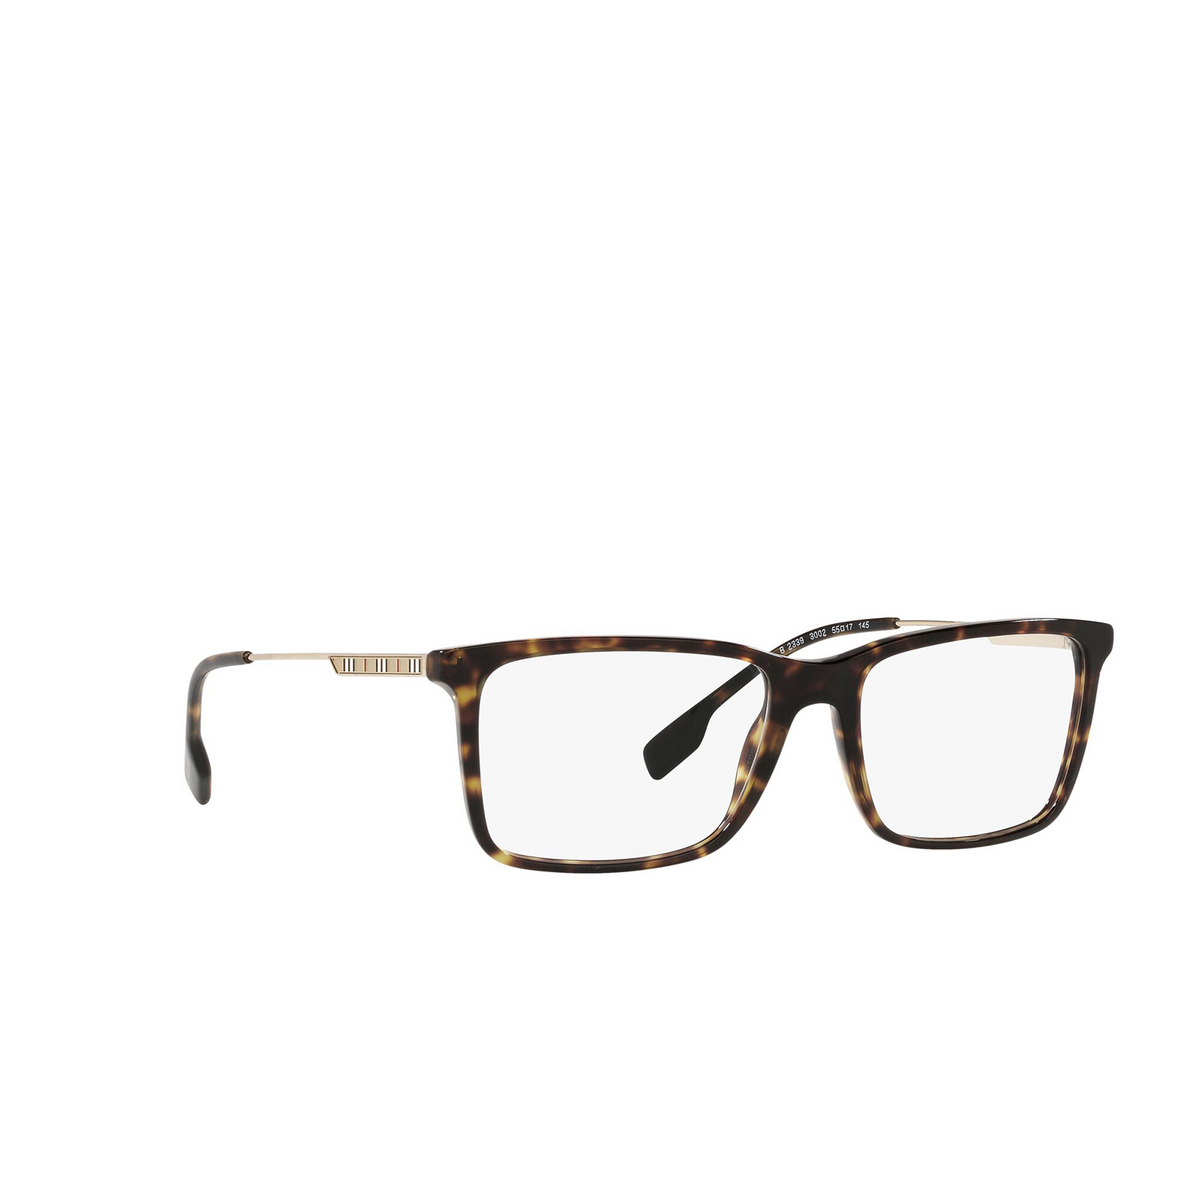 Burberry® Rectangle Eyeglasses: Harrington BE2339 color Dark Havana 3002 - three-quarters view.